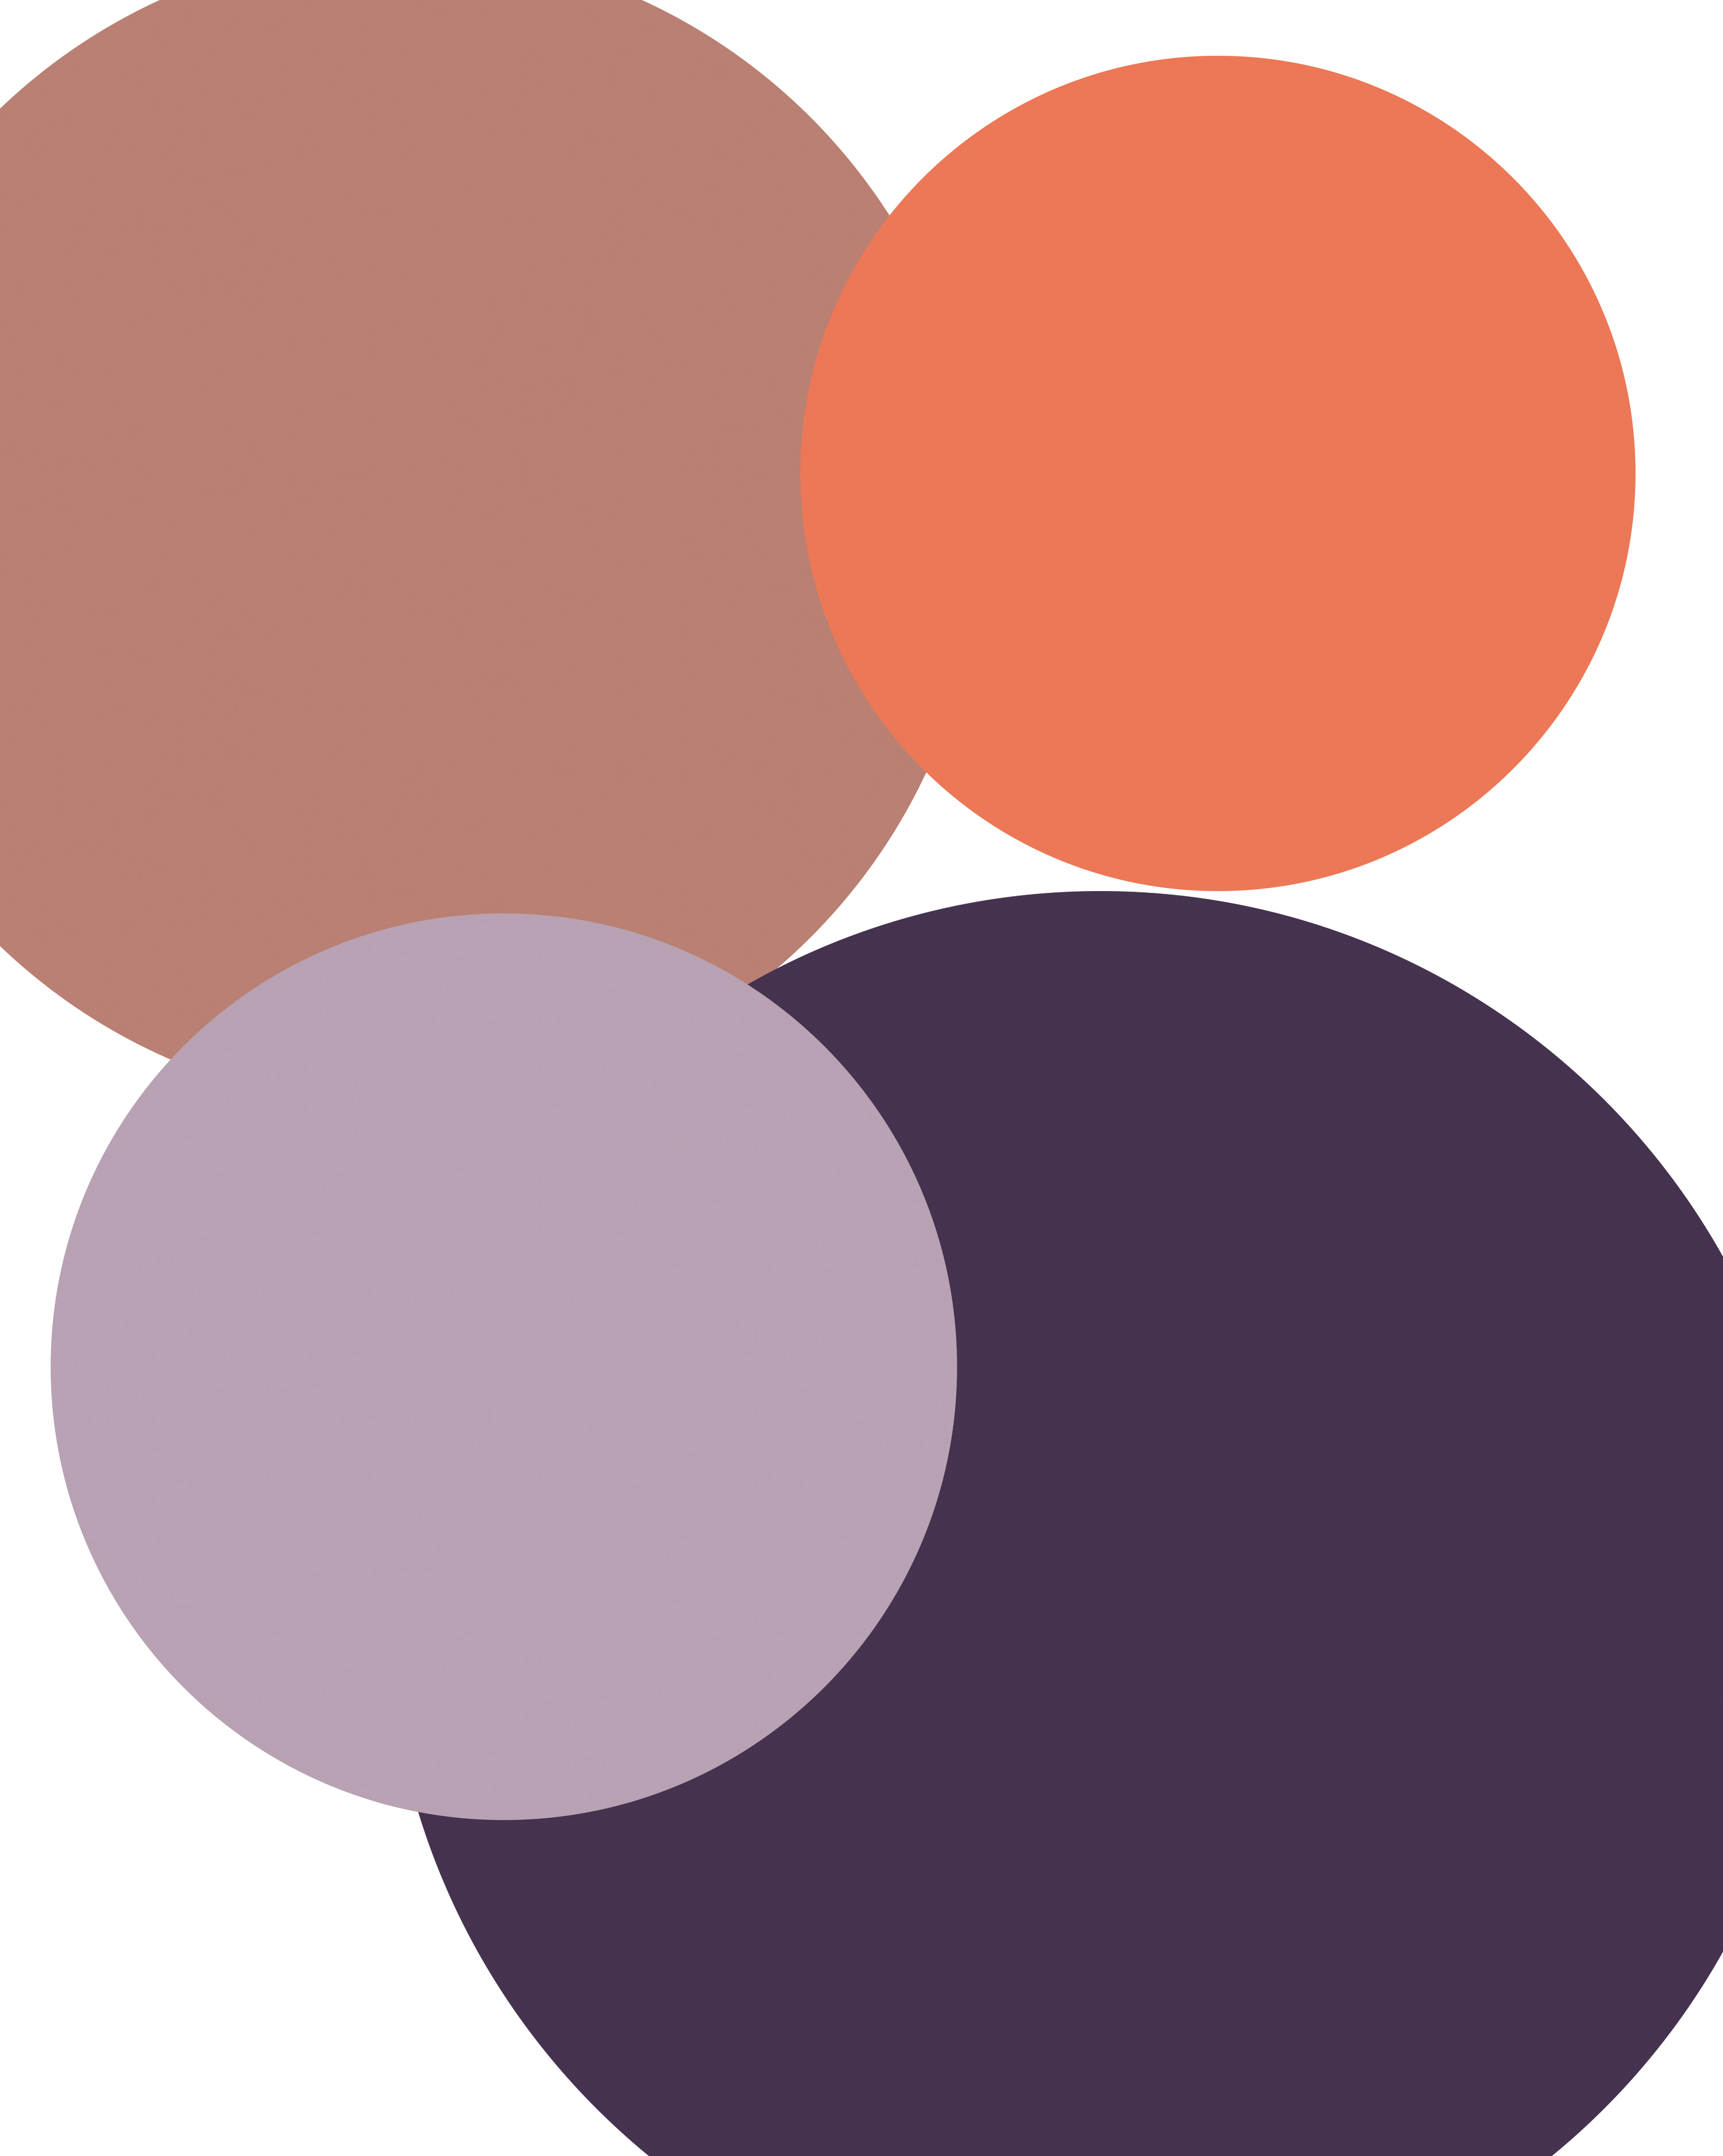 fall-wedding-colors-taupe-lilac-plum-peach-0915.jpg